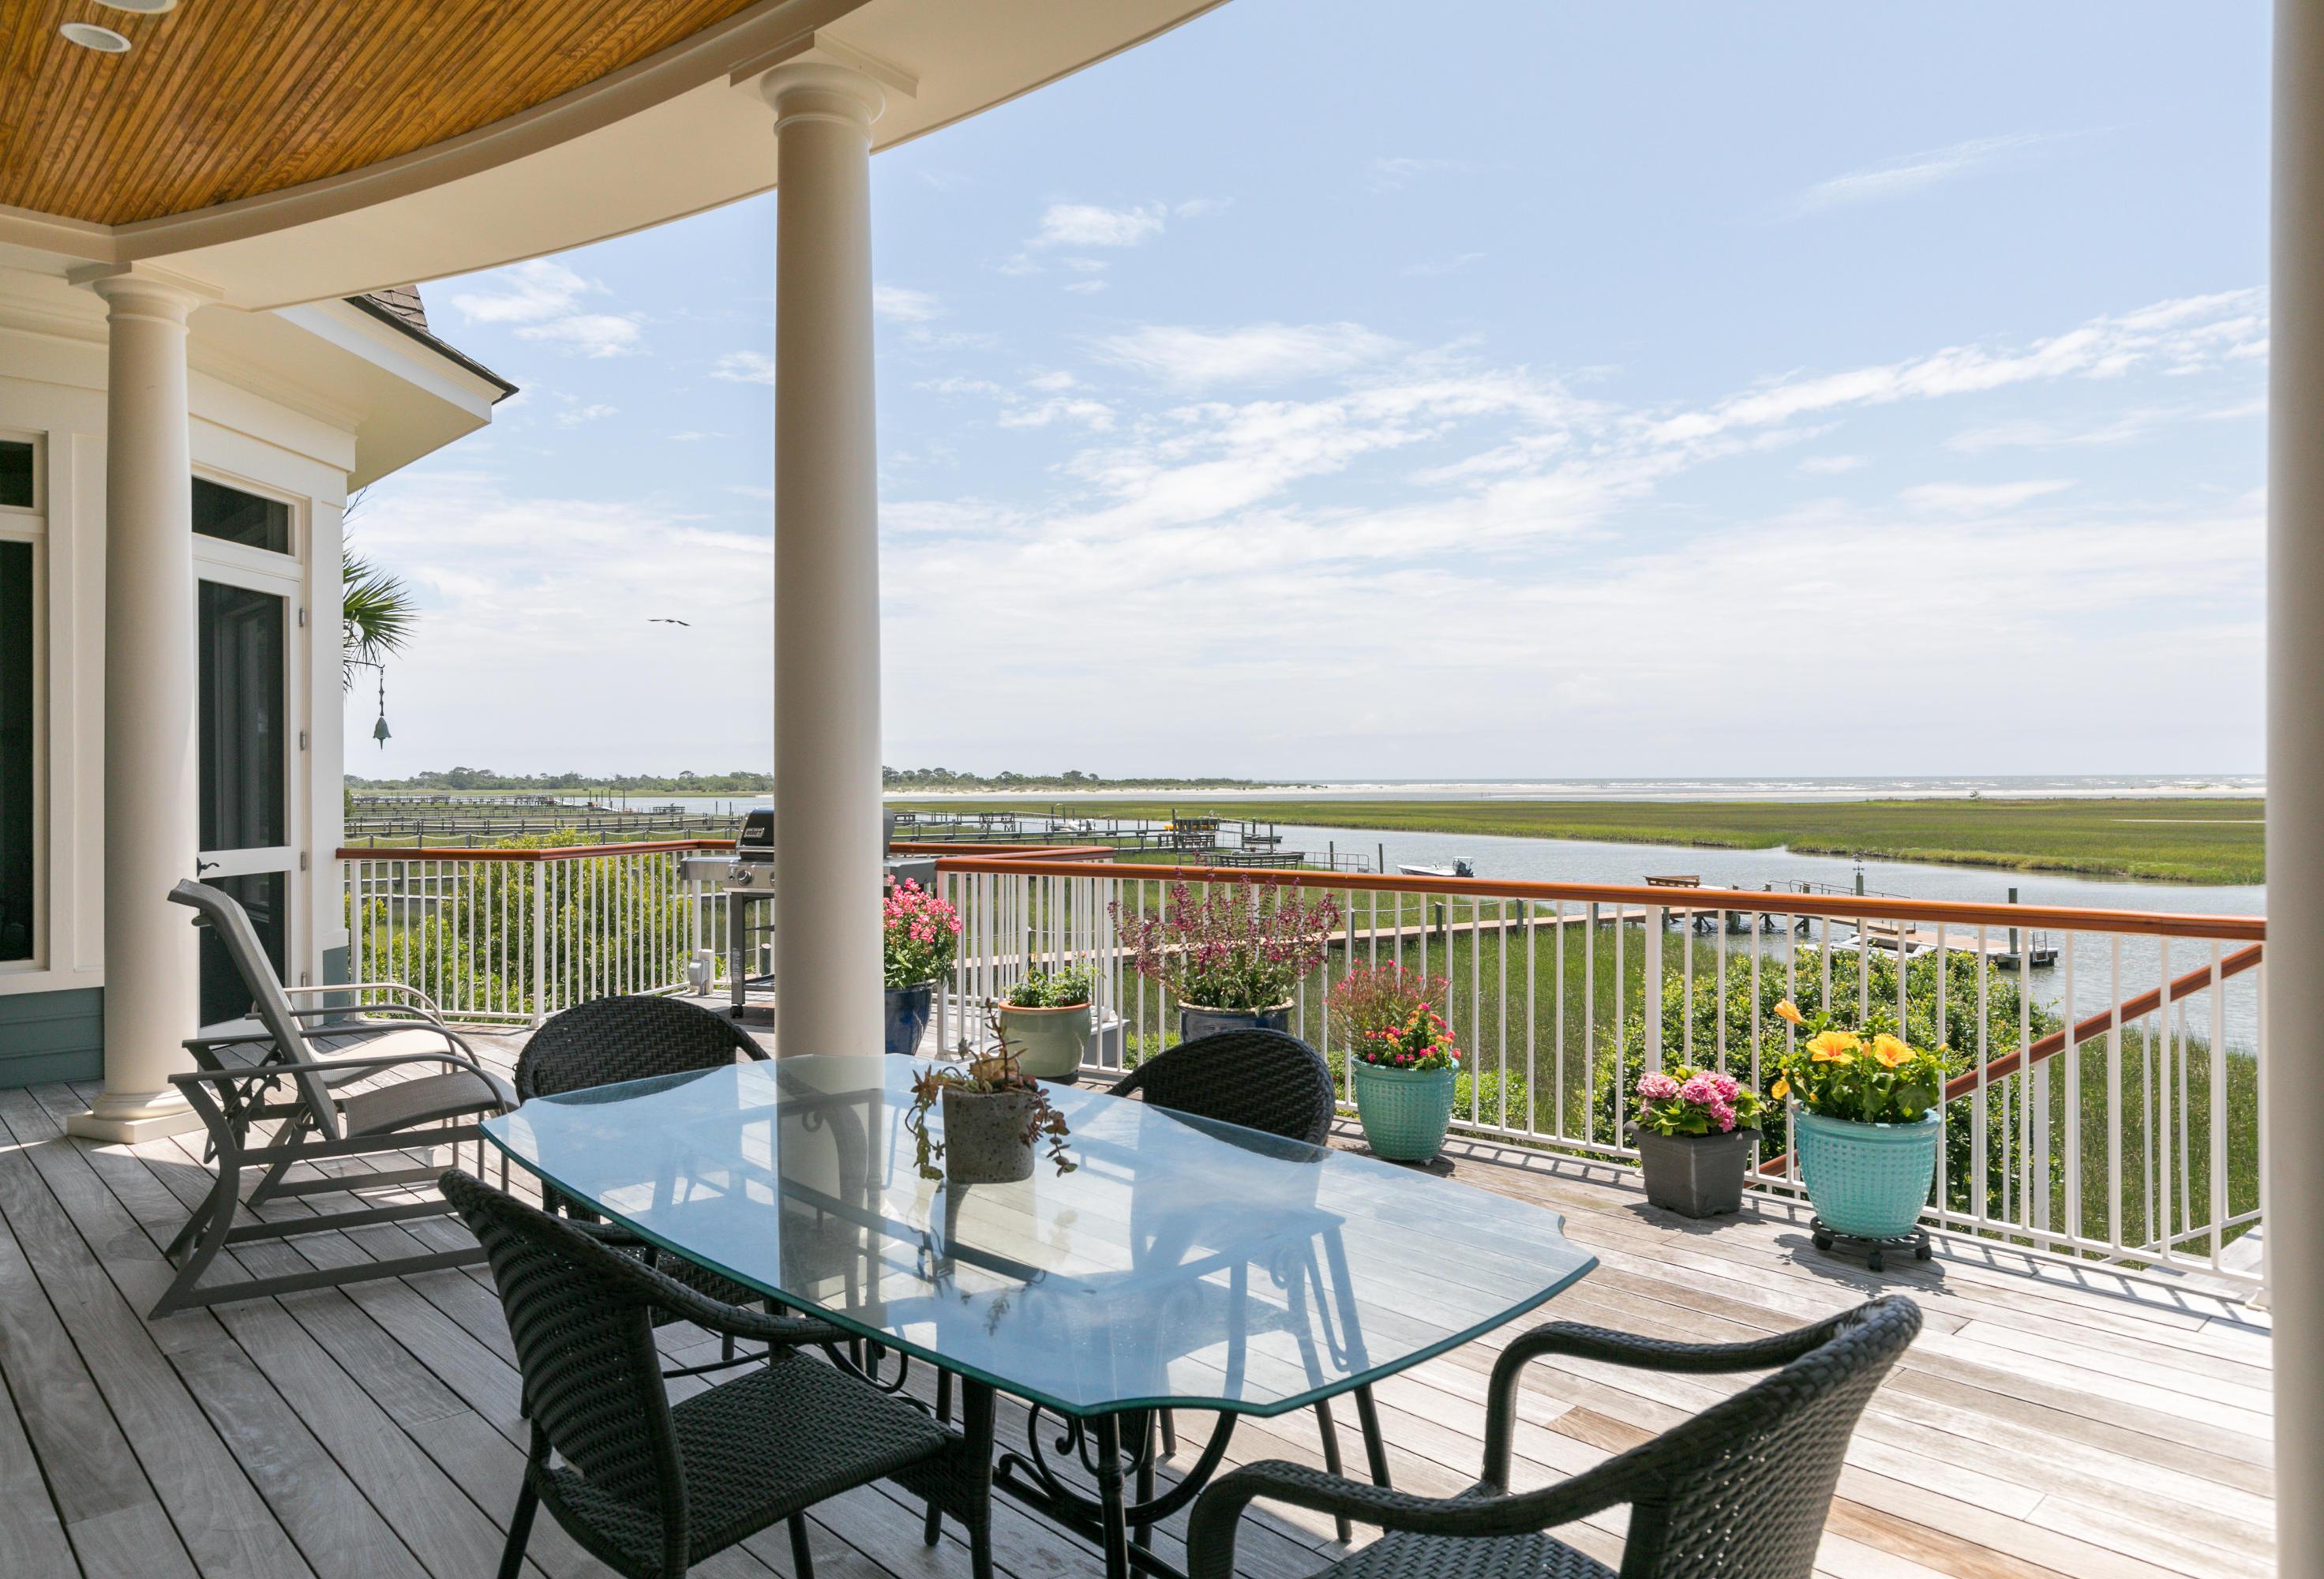 Seabrook Island Homes For Sale - 3033 Marshgate, Johns Island, SC - 22